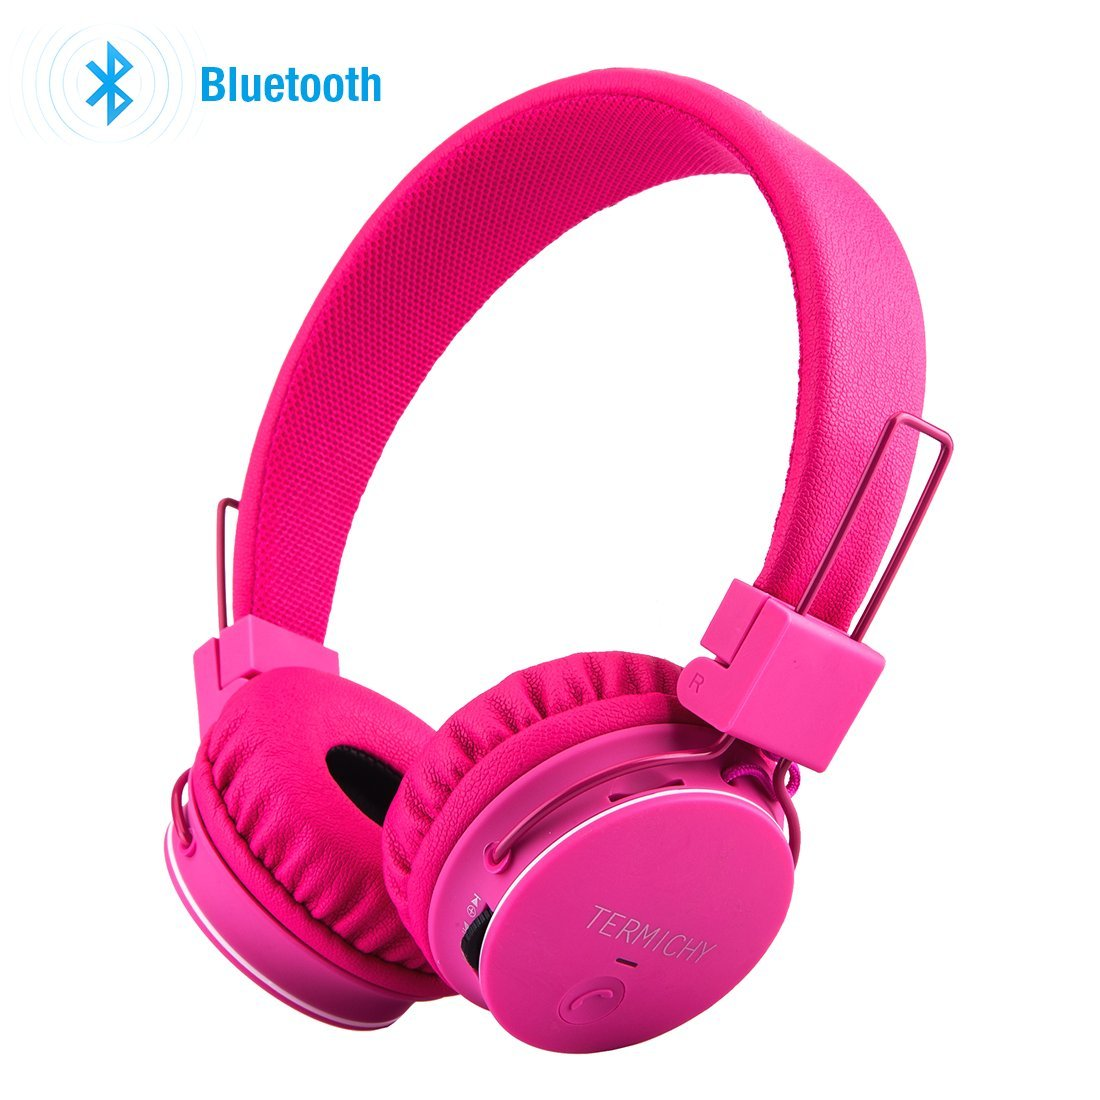 Bluetooth Volume Limiting Kids Headphones,Sodee Wireless